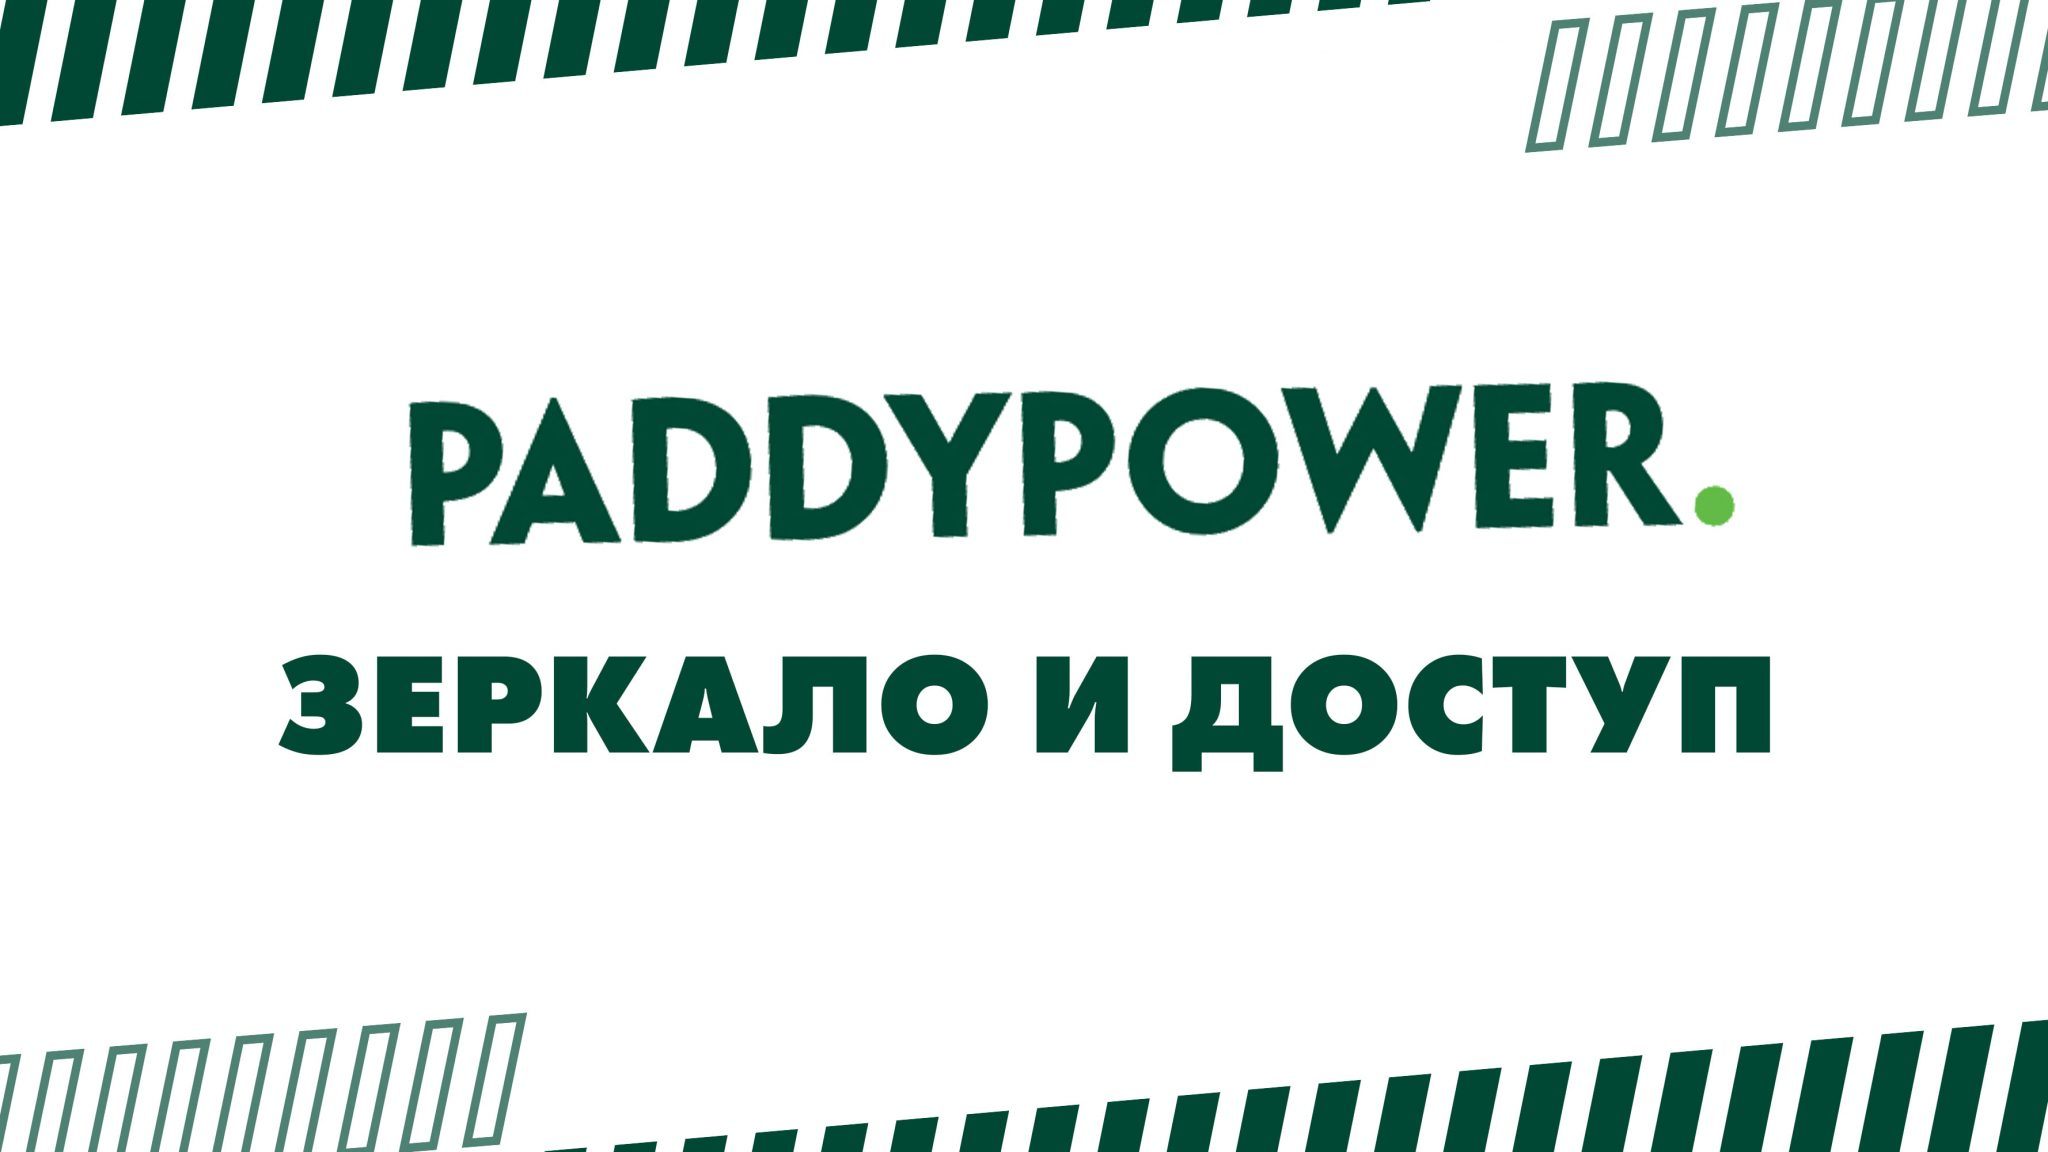 БК Paddy Power зеркало и доступ к сайту